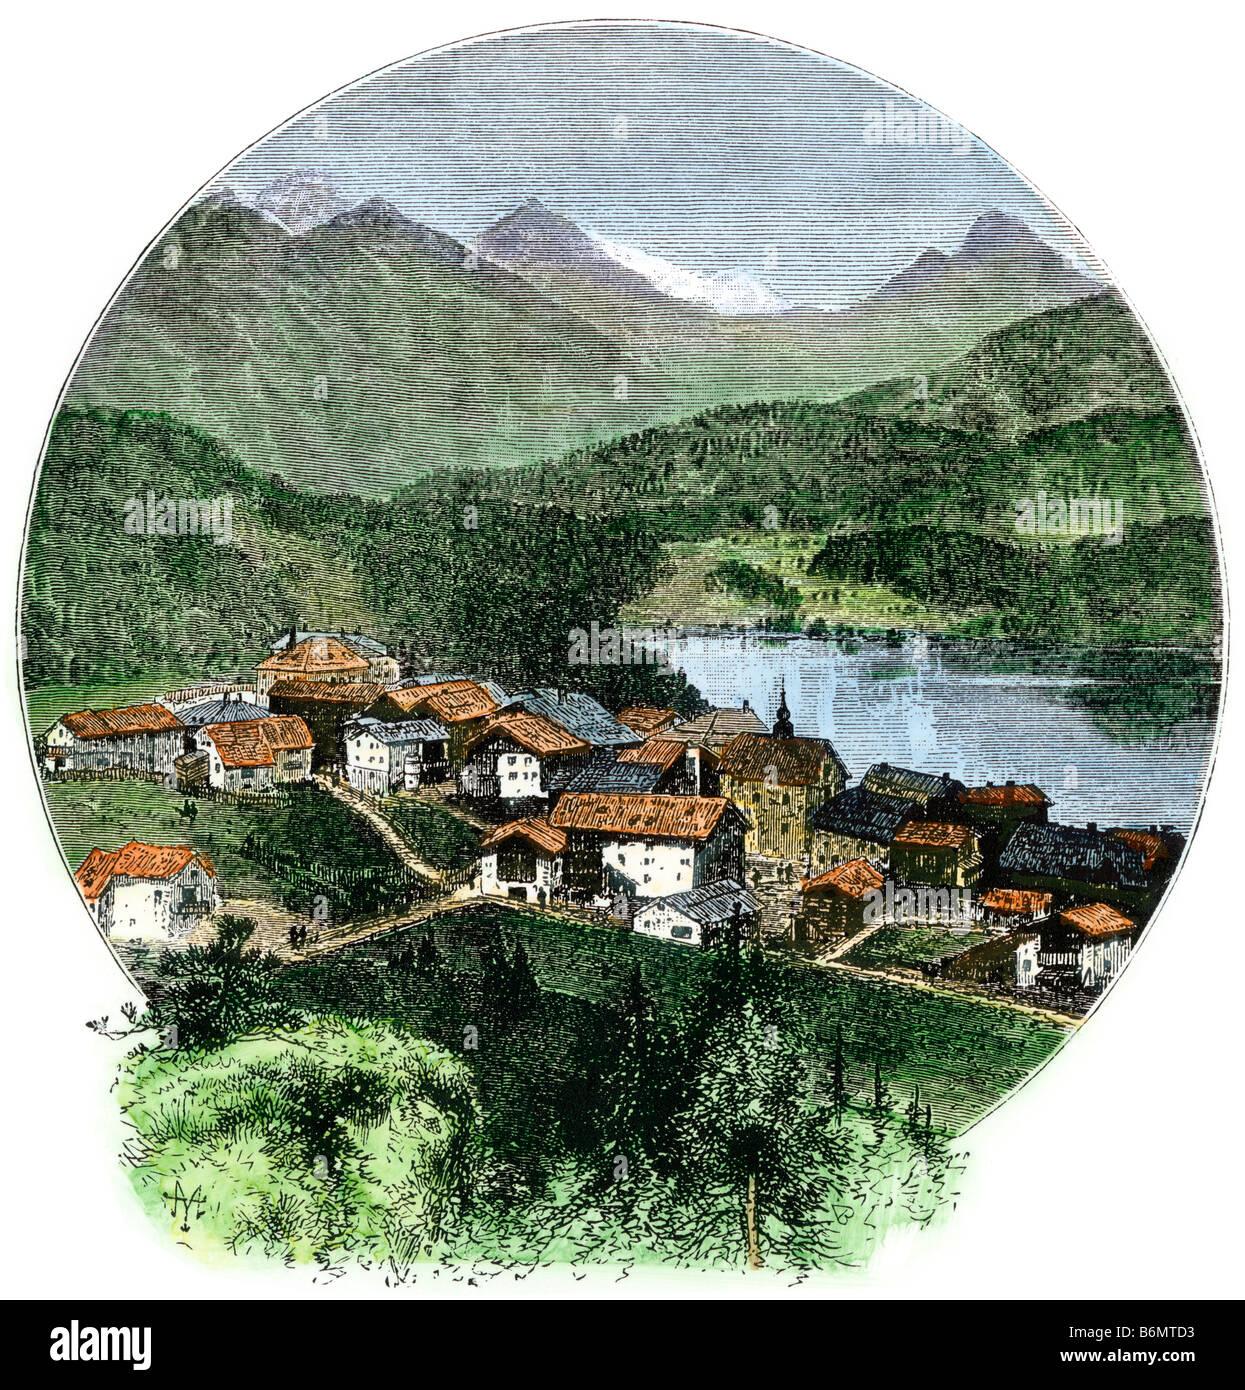 Village of Saint Moritz Switzerland in the 1870s. Hand-colored woodcut - Stock Image